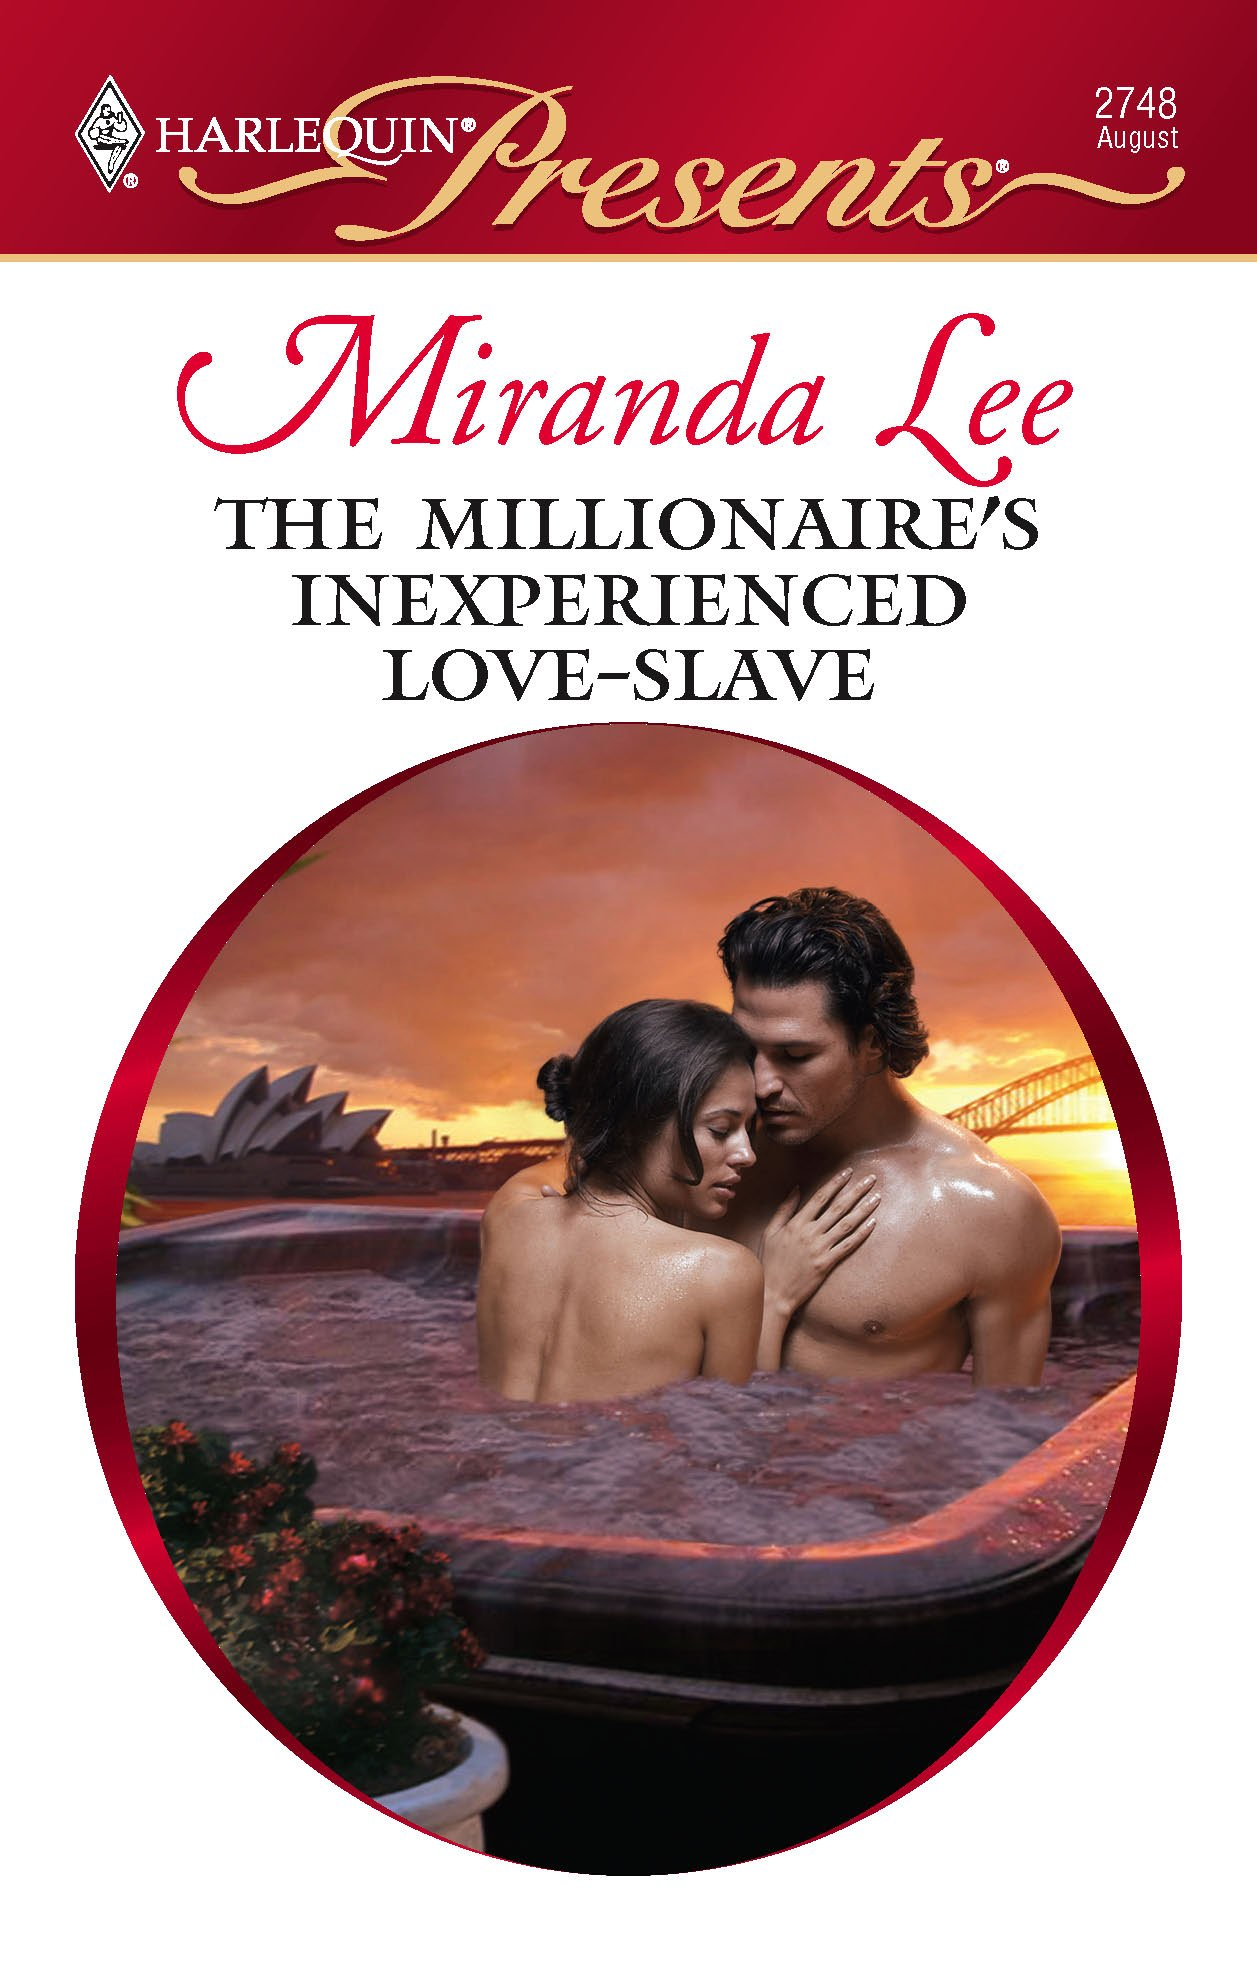 Sydnee capri romance novel sex